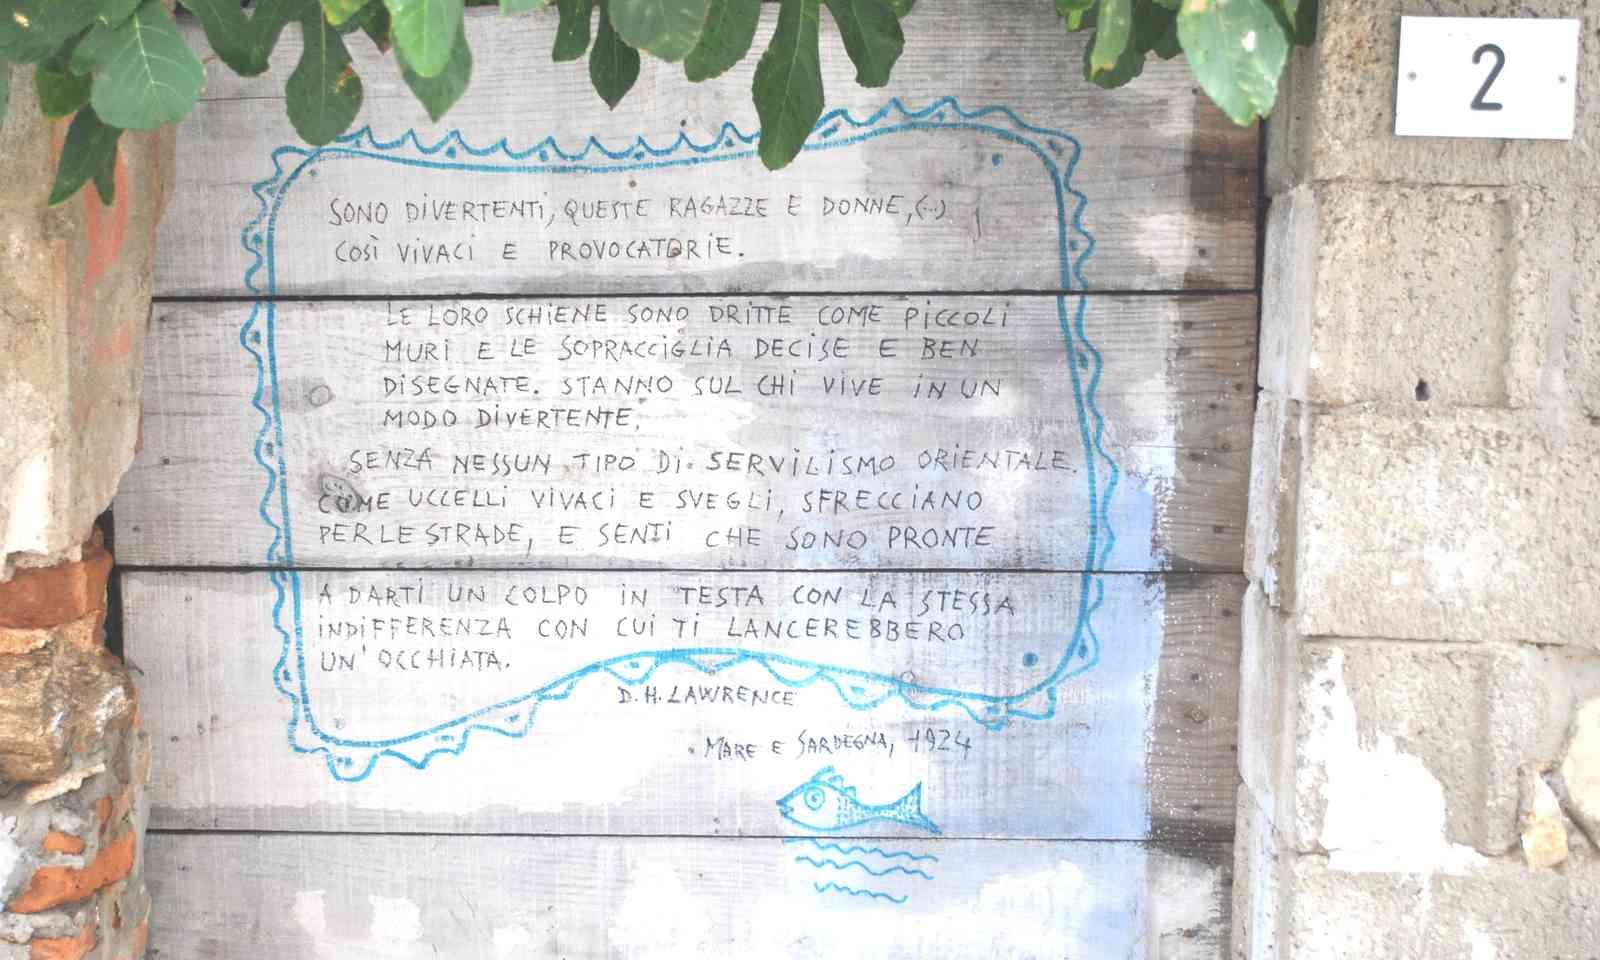 Poem on a wall in Posada (Rosanna Ley)